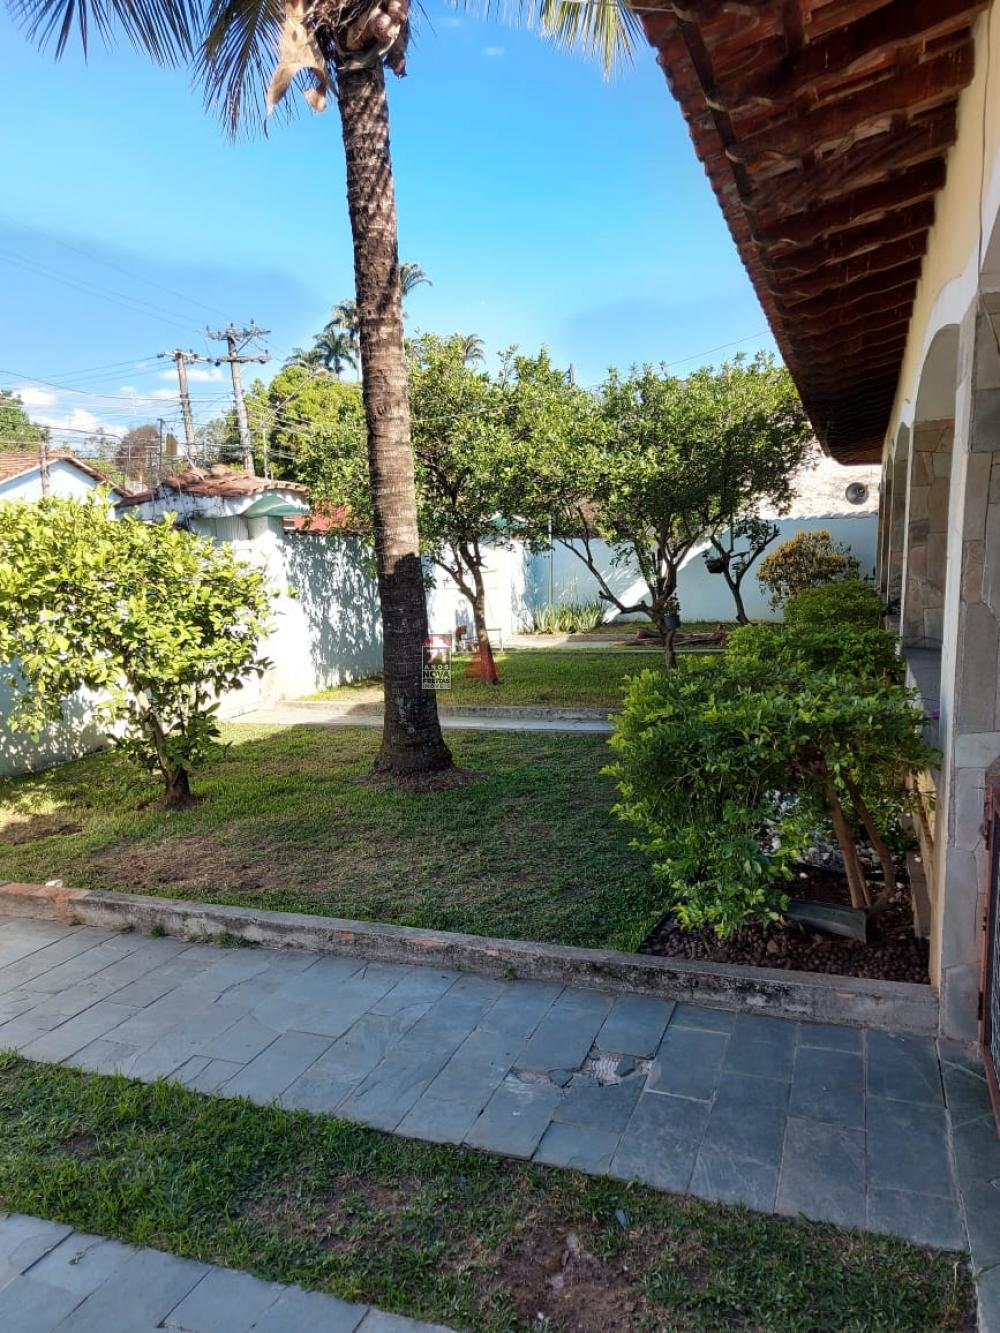 Comprar Casa / Padrão em Pindamonhangaba R$ 900.000,00 - Foto 17